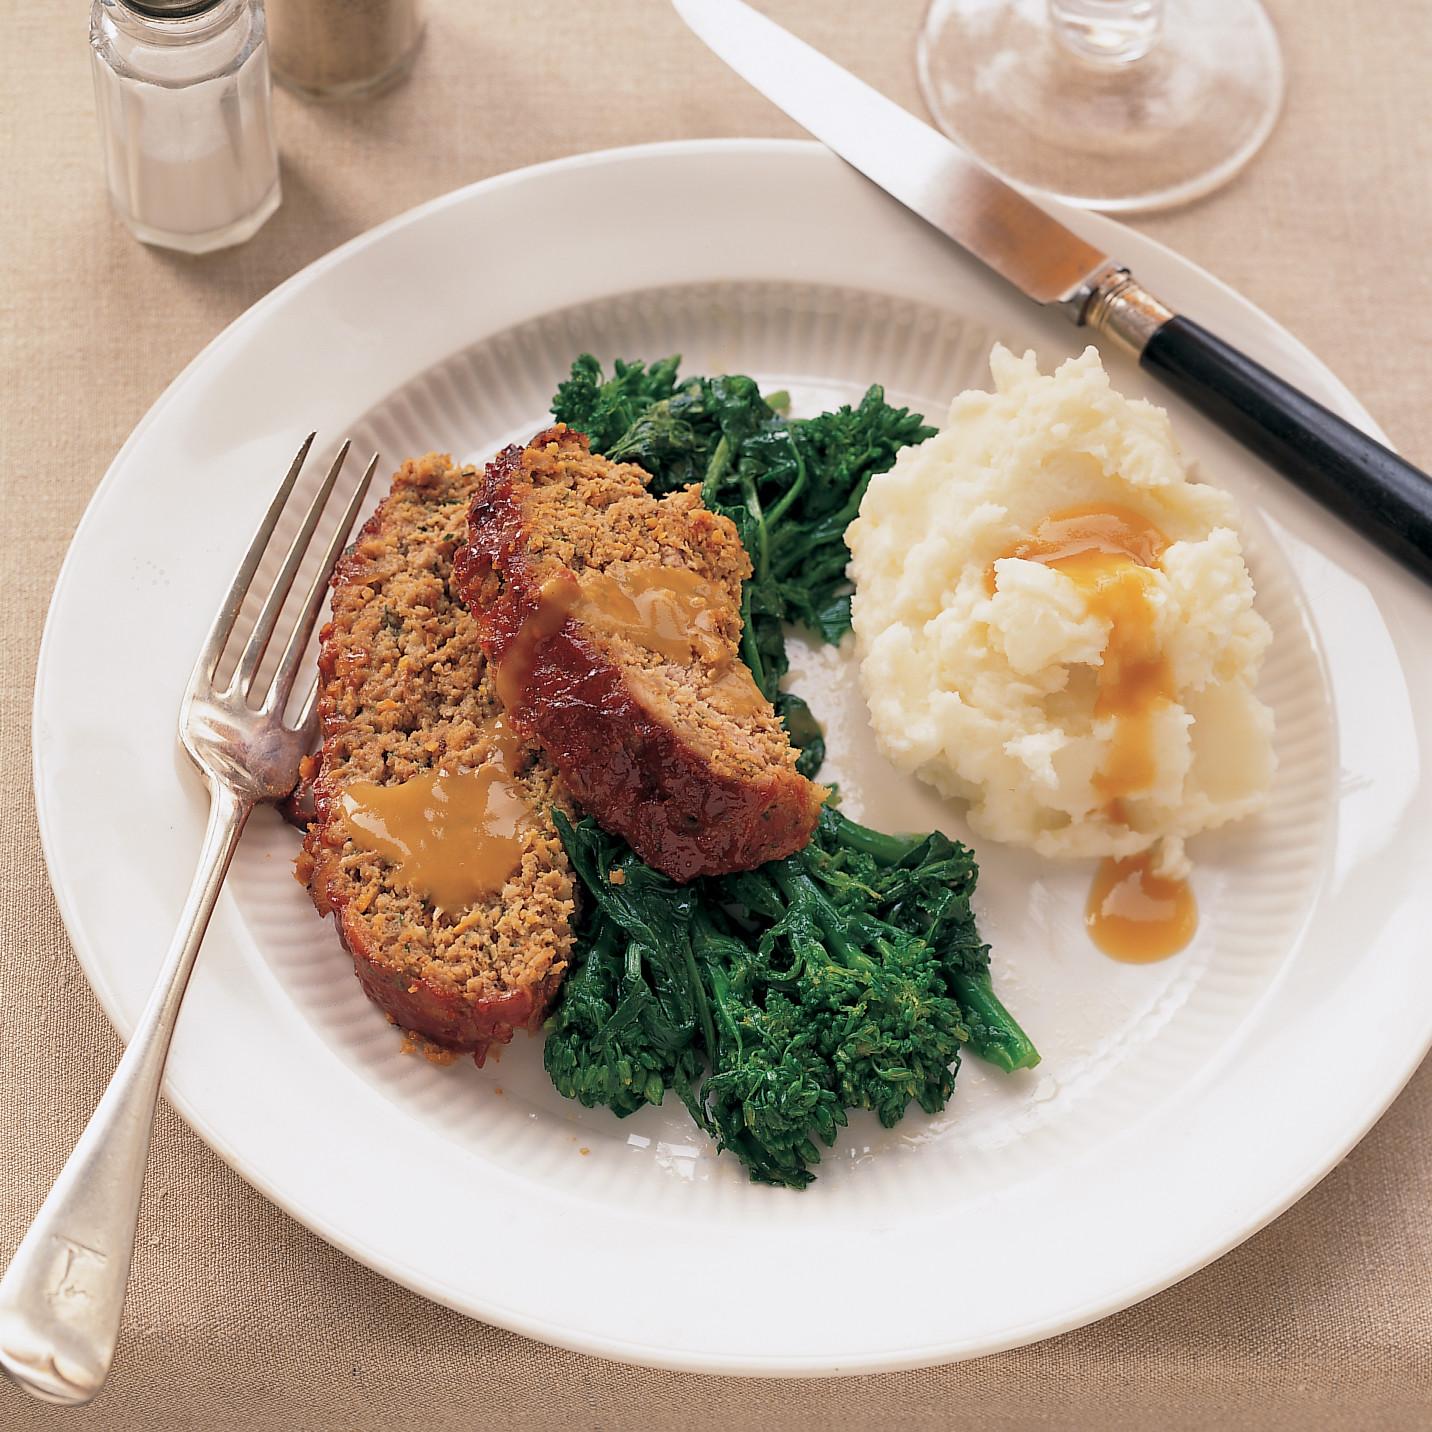 Everyday food meatloaf recipes